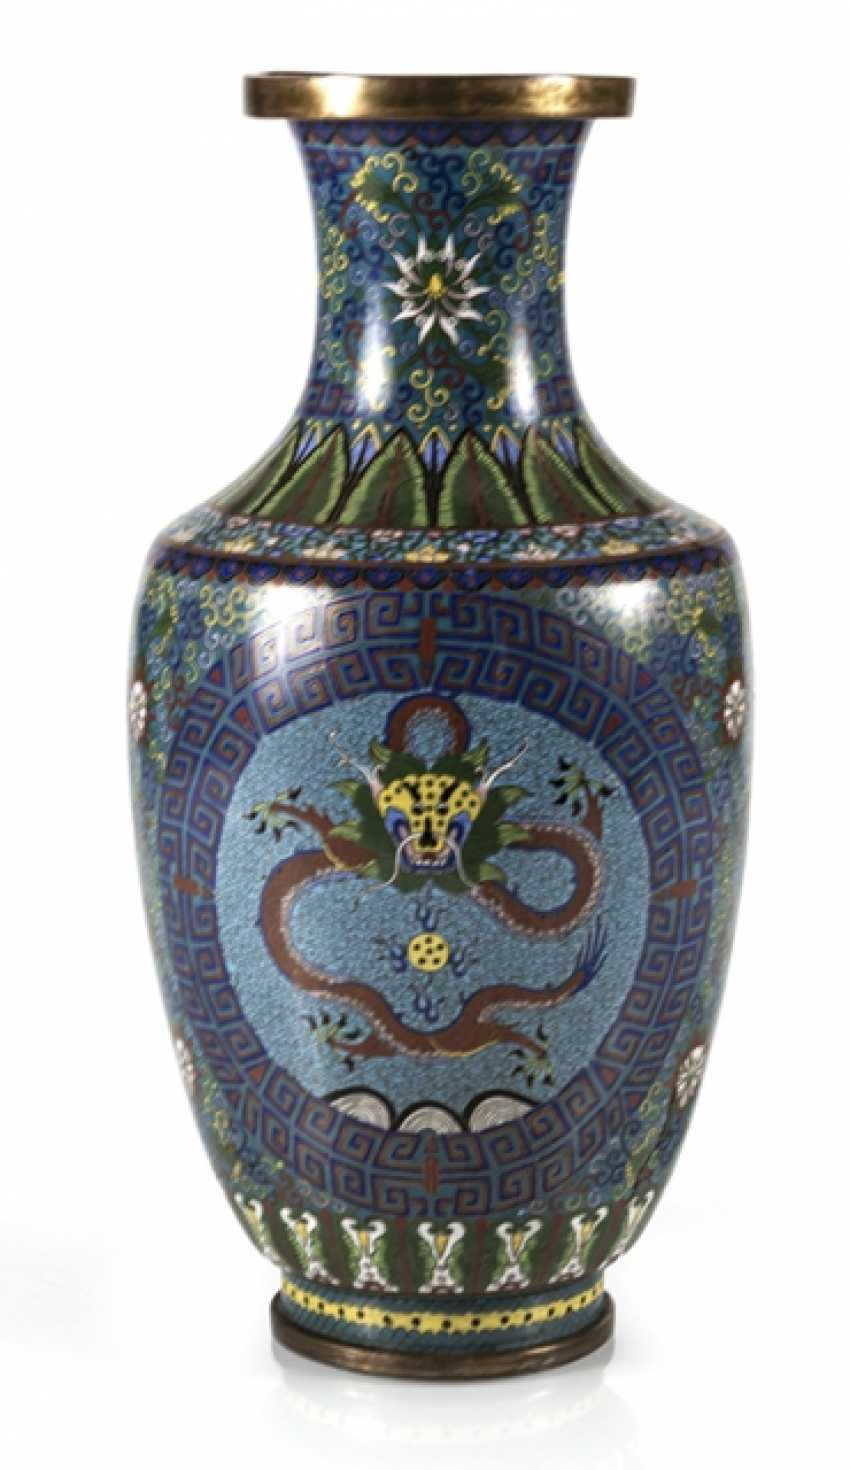 Cloisonné Vase with decorative fünfklauiger dragons in reserves, on Lotus base - photo 1